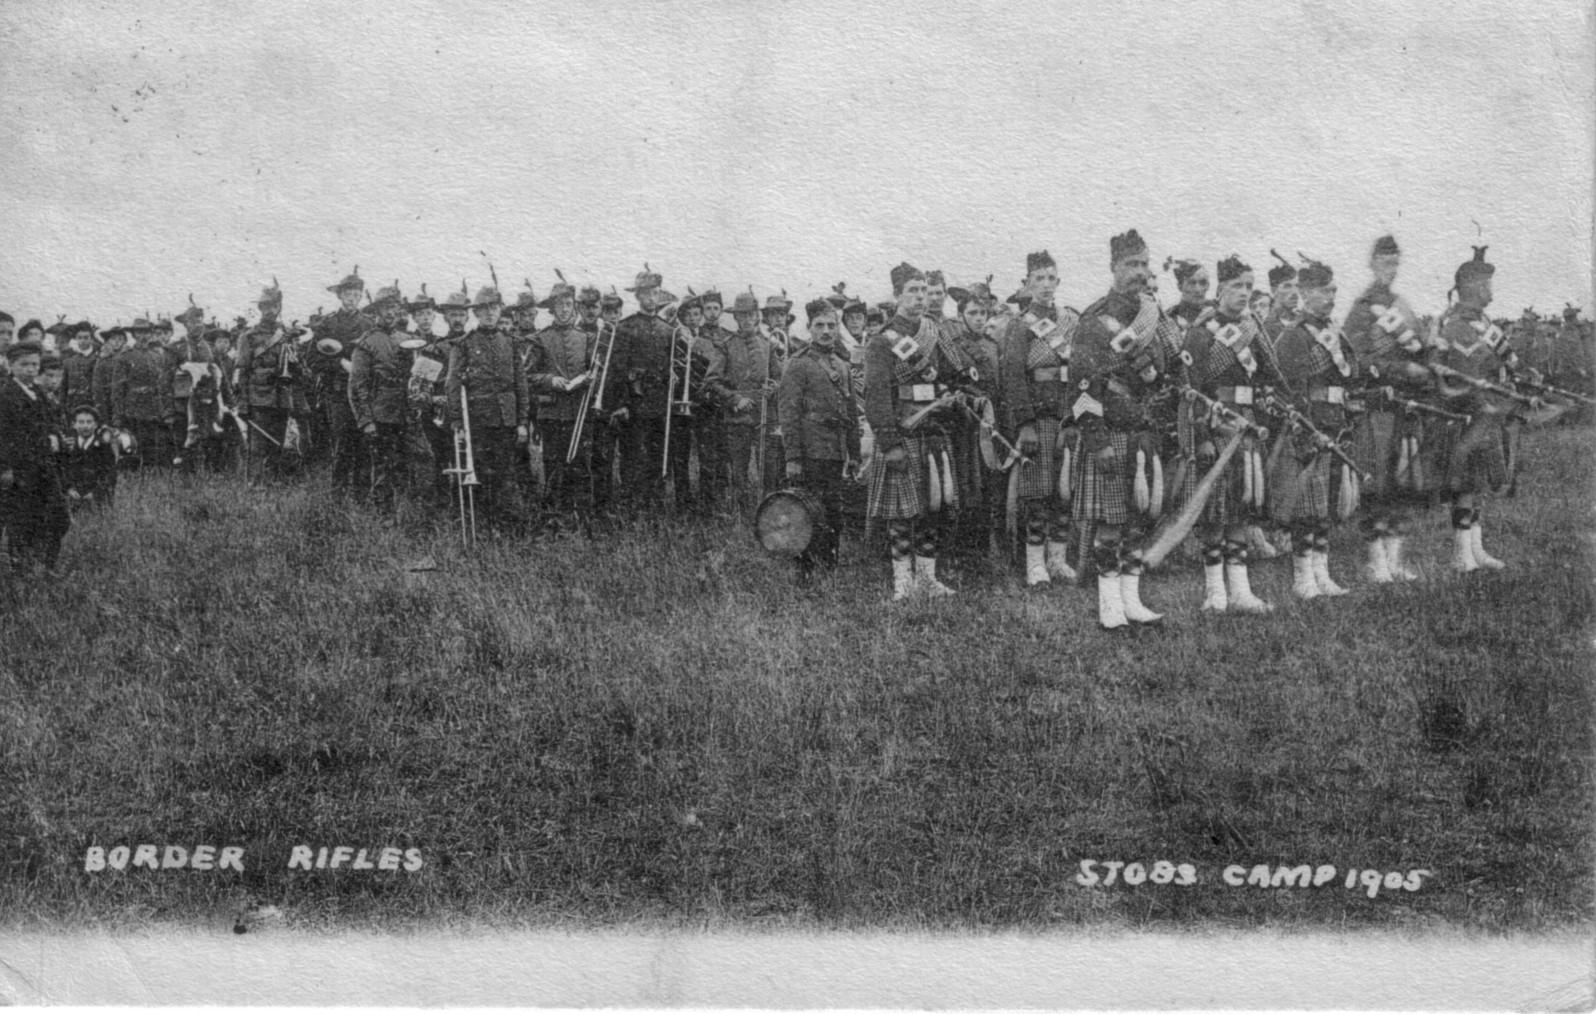 border rifles; 1905; stobs camp; musicians; instruments; kilts;